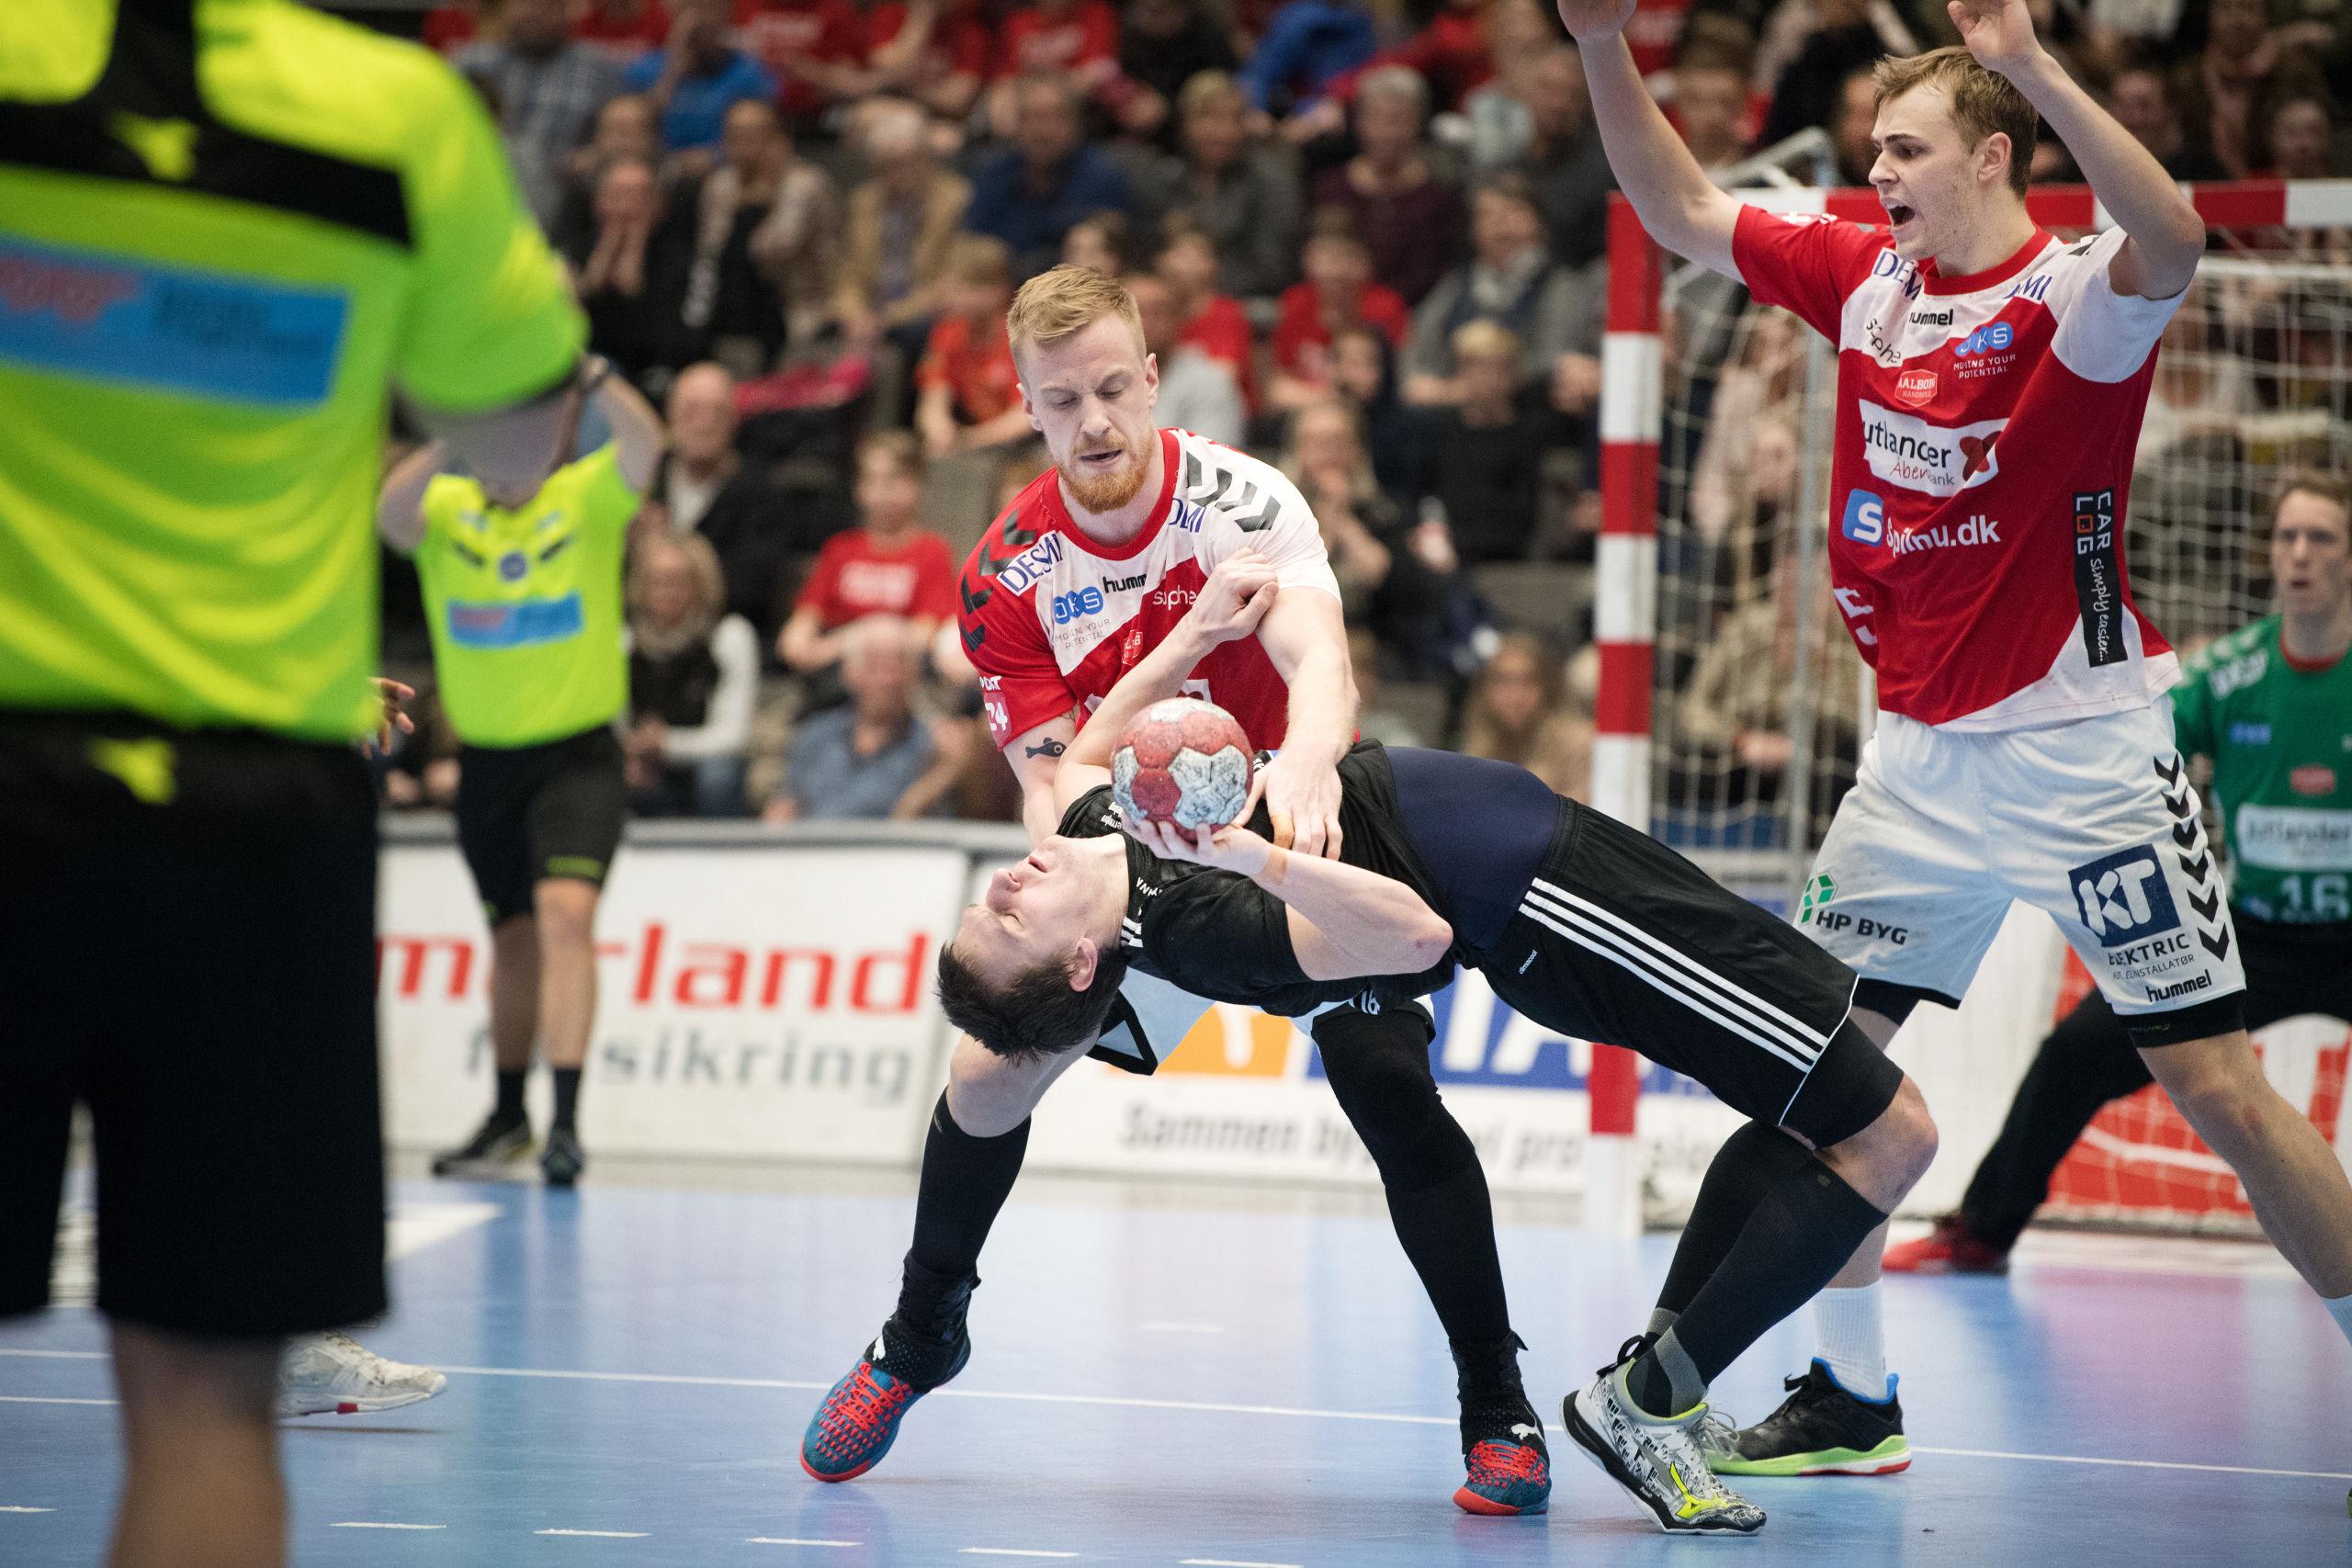 Emil Halkier